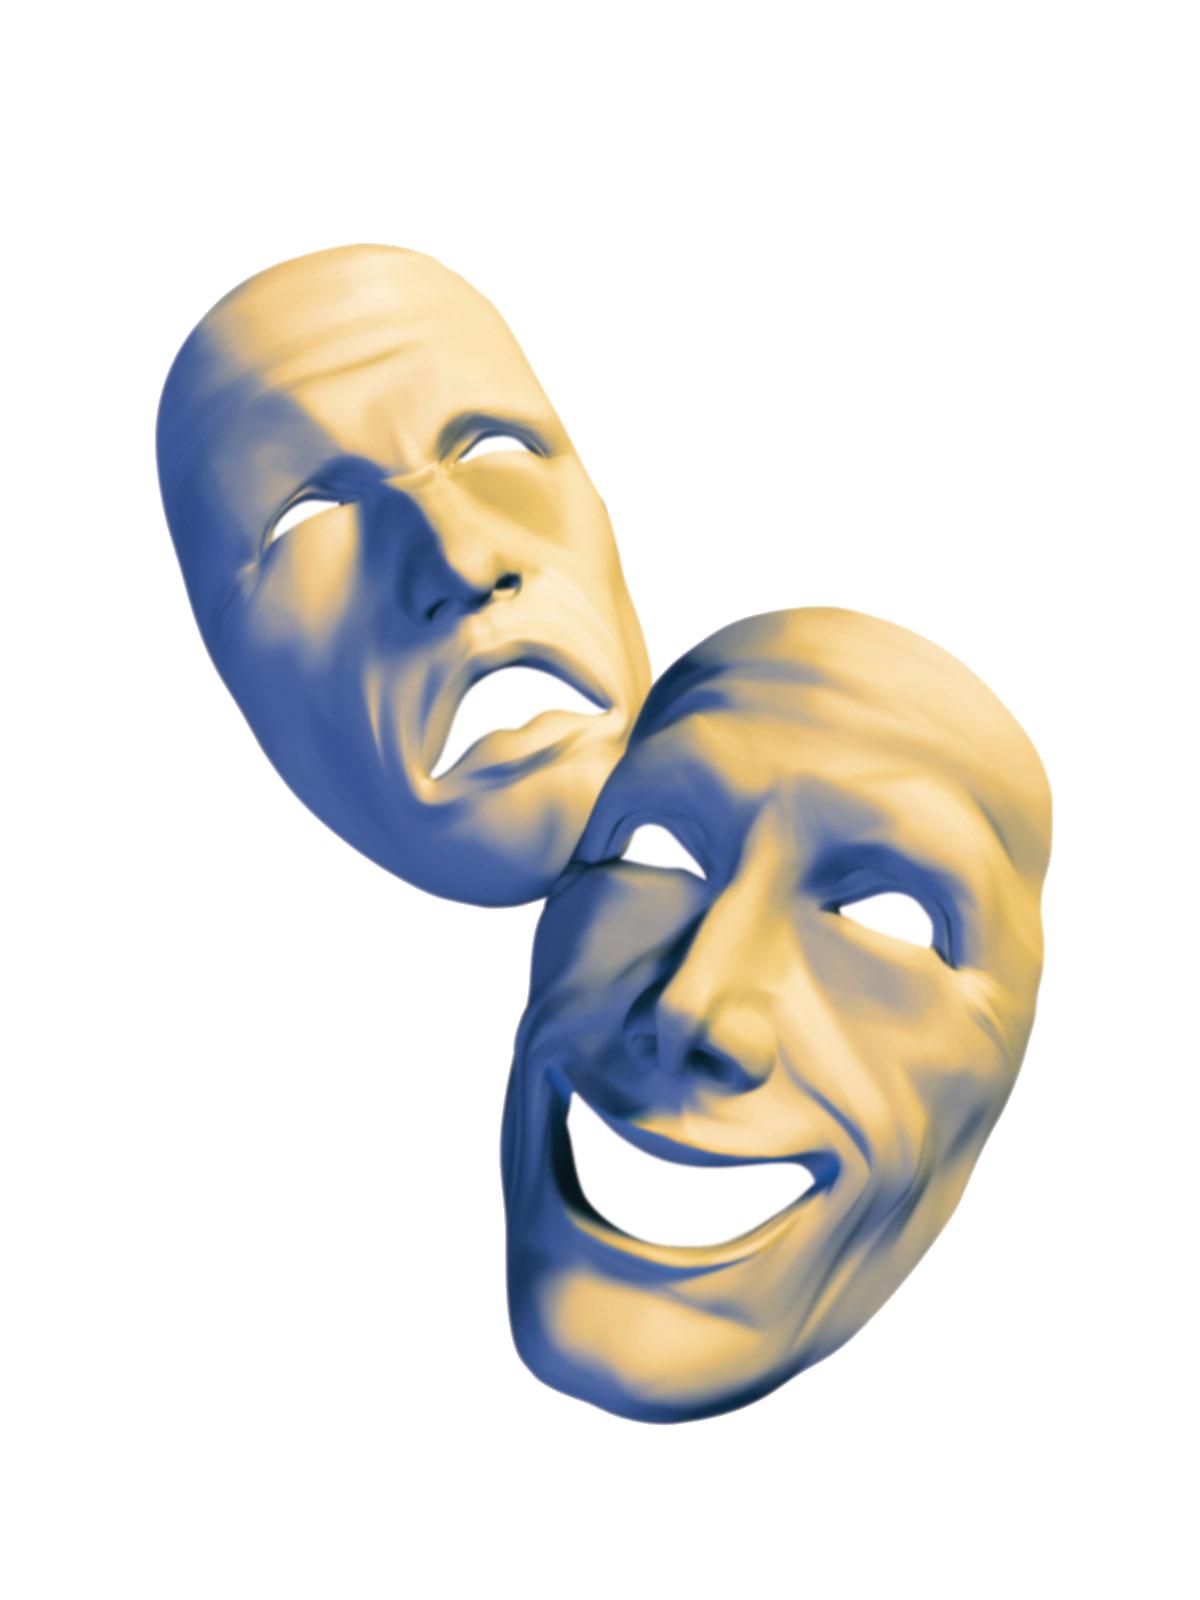 free theatre mask  download free clip art  free clip art Drama Symbol drama masks clipart black and white